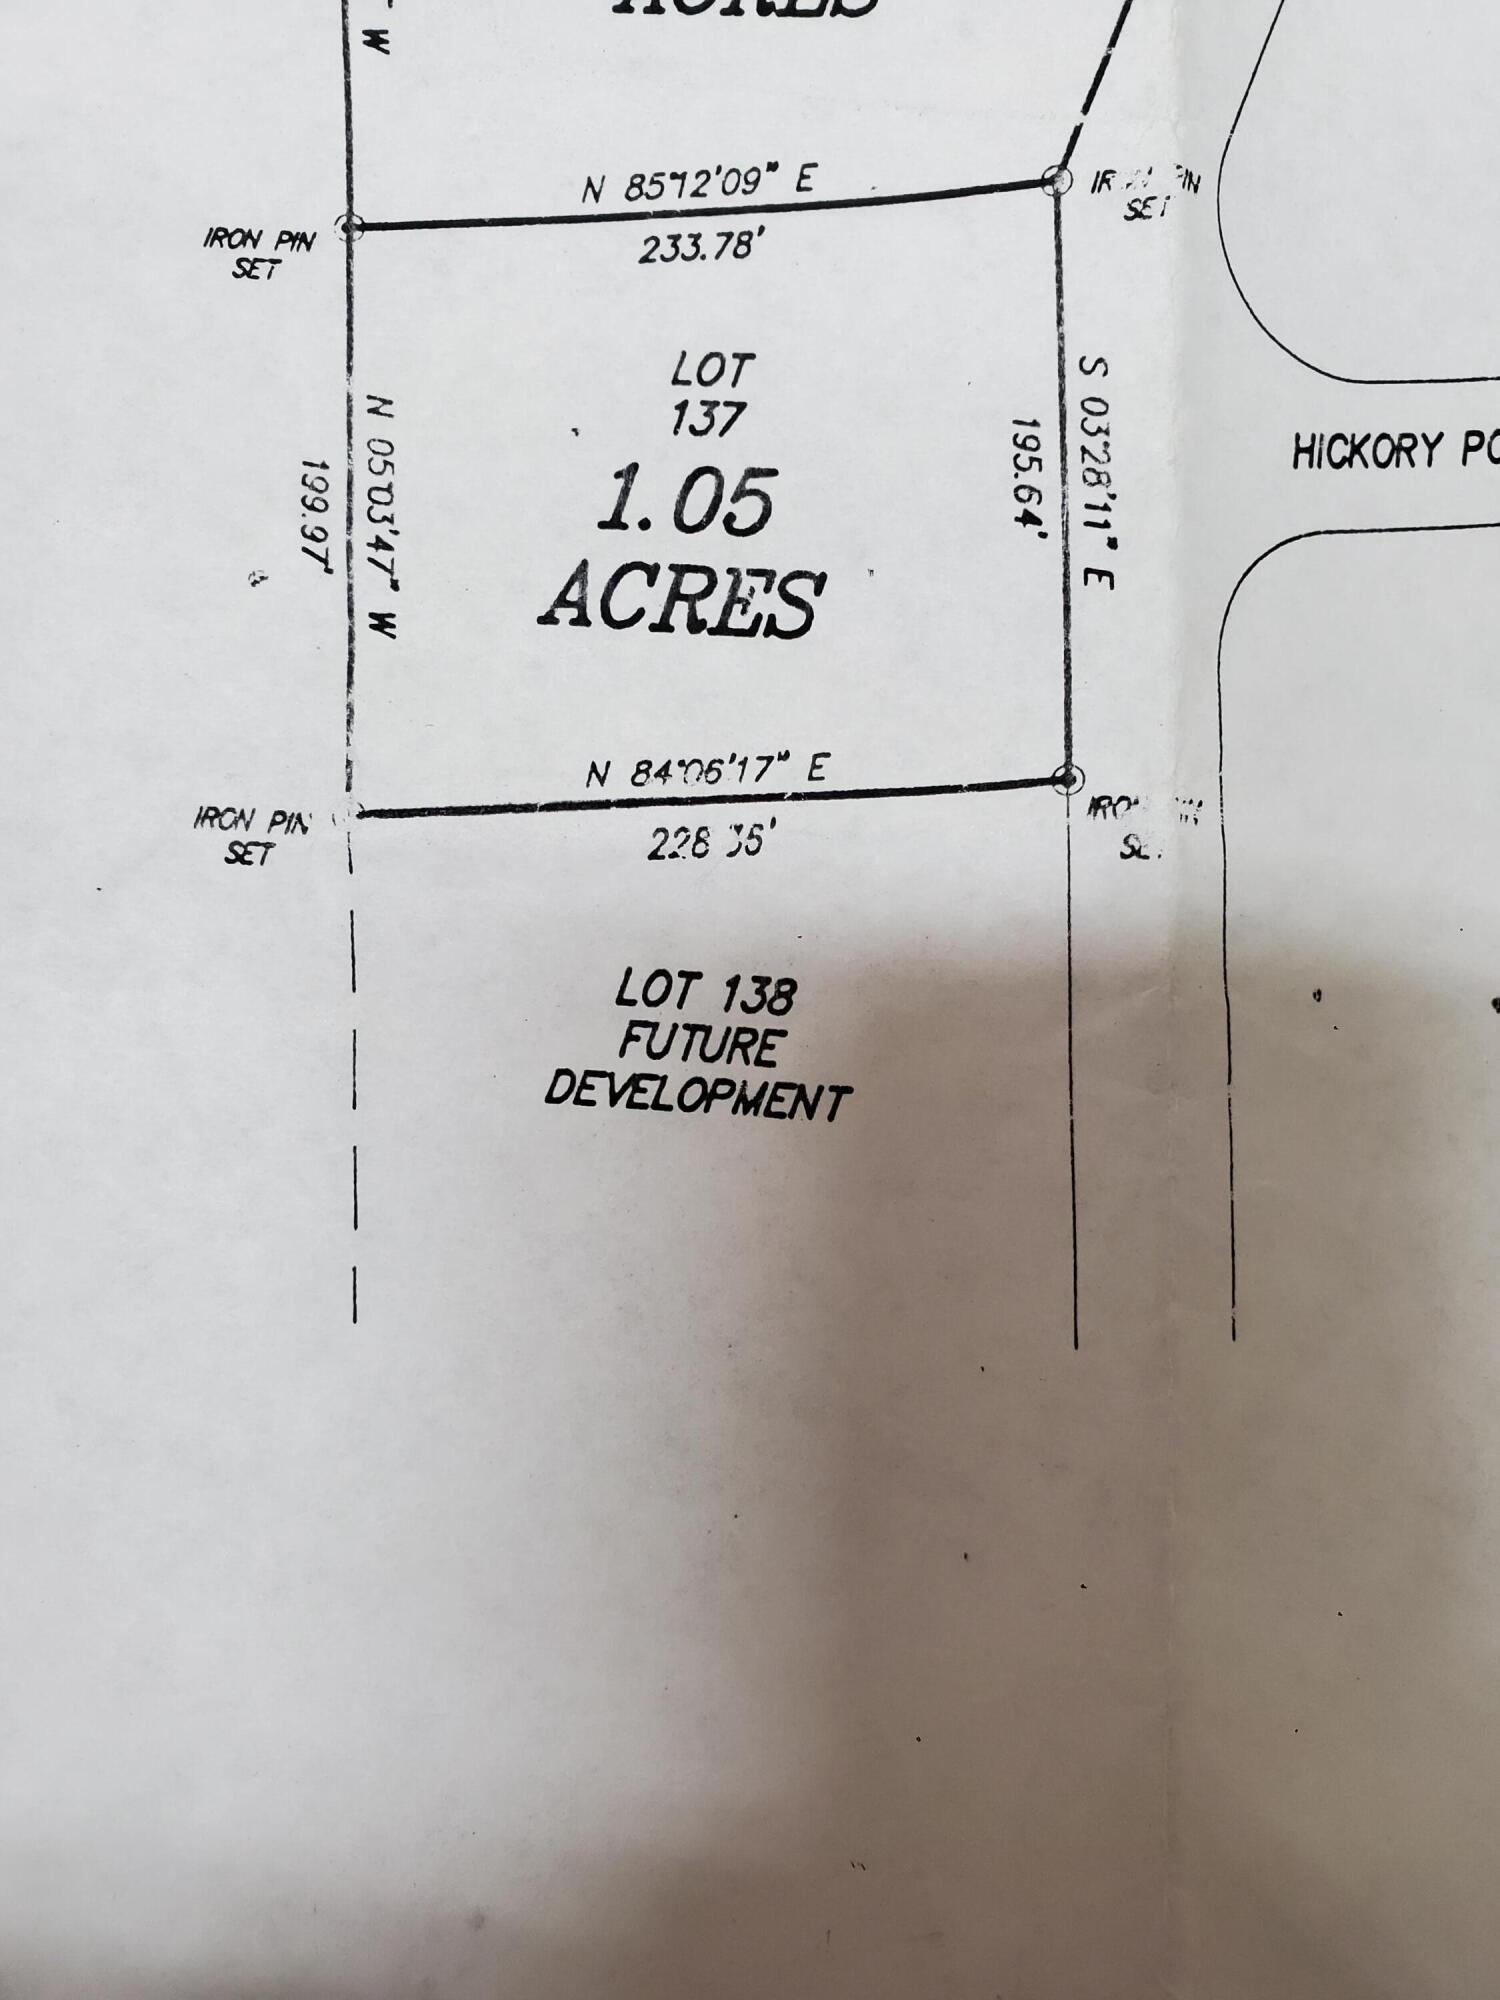 Lot 137, Hickory Pointe Lane: